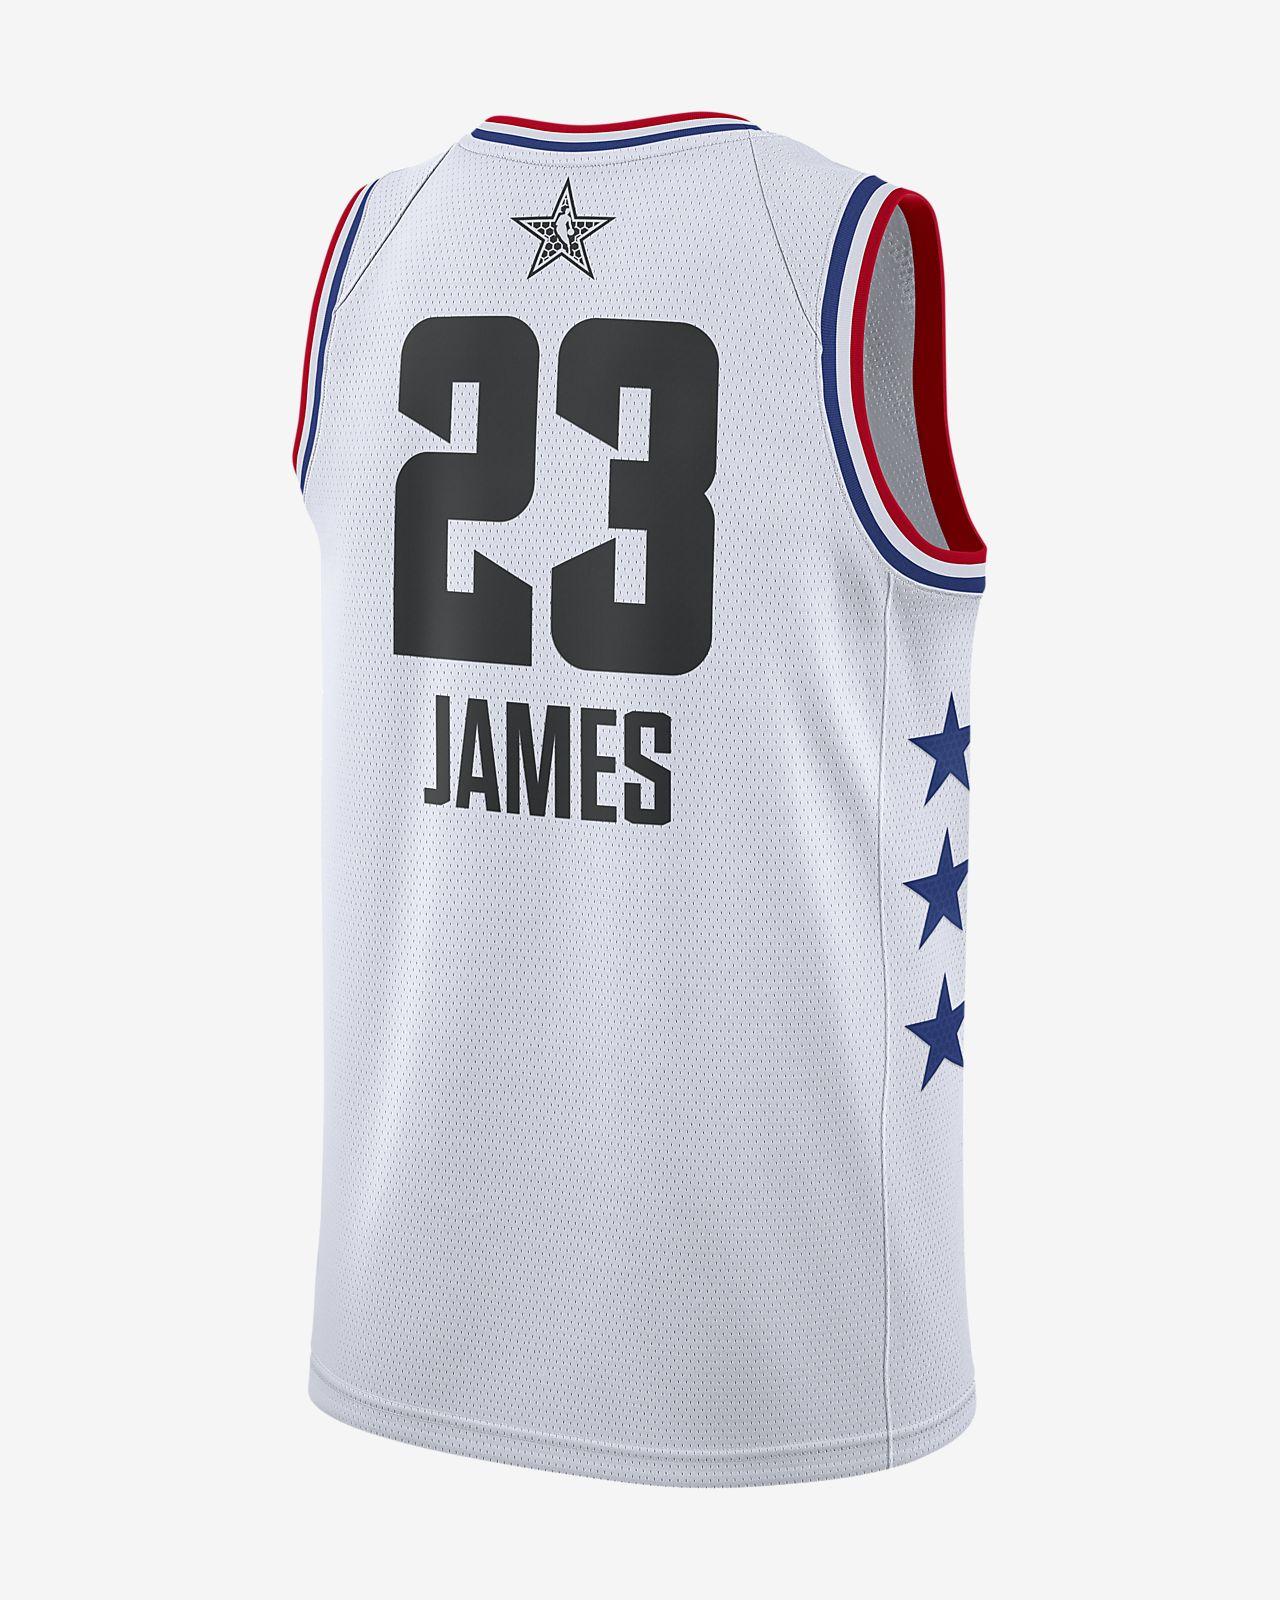 14a3dac0918 ... LeBron James All-Star Edition Swingman Men s Jordan NBA Connected Jersey